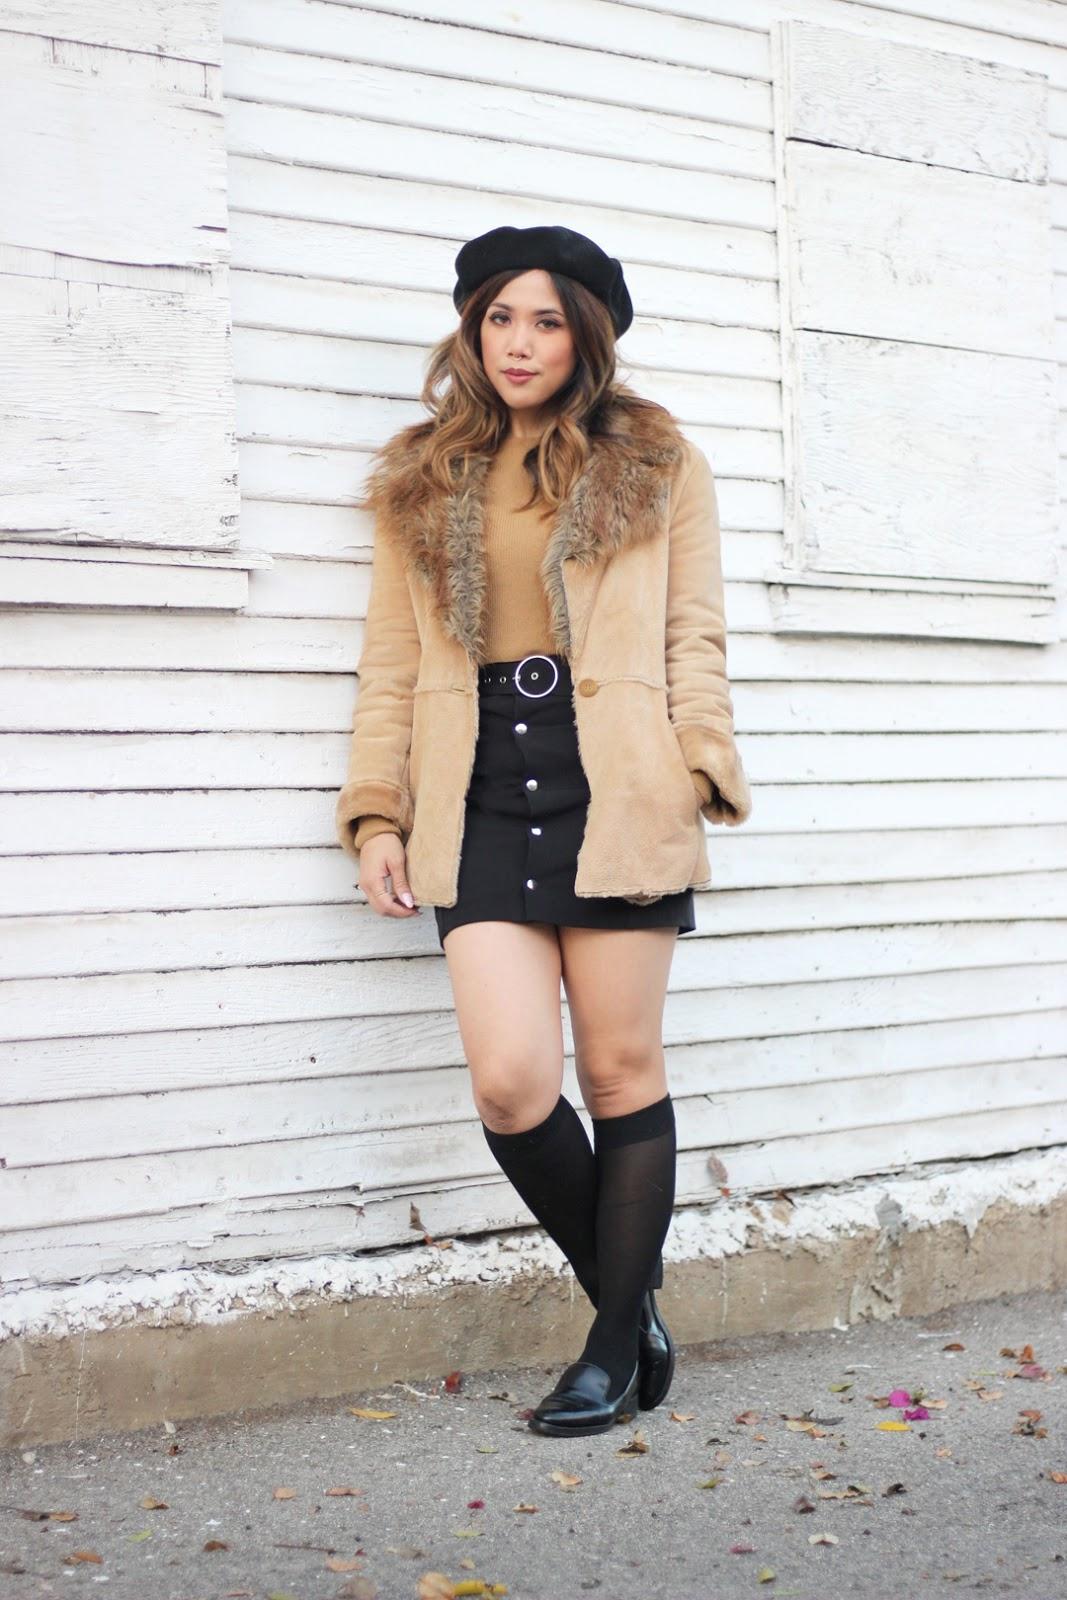 winter in mini skirts pretty in leather